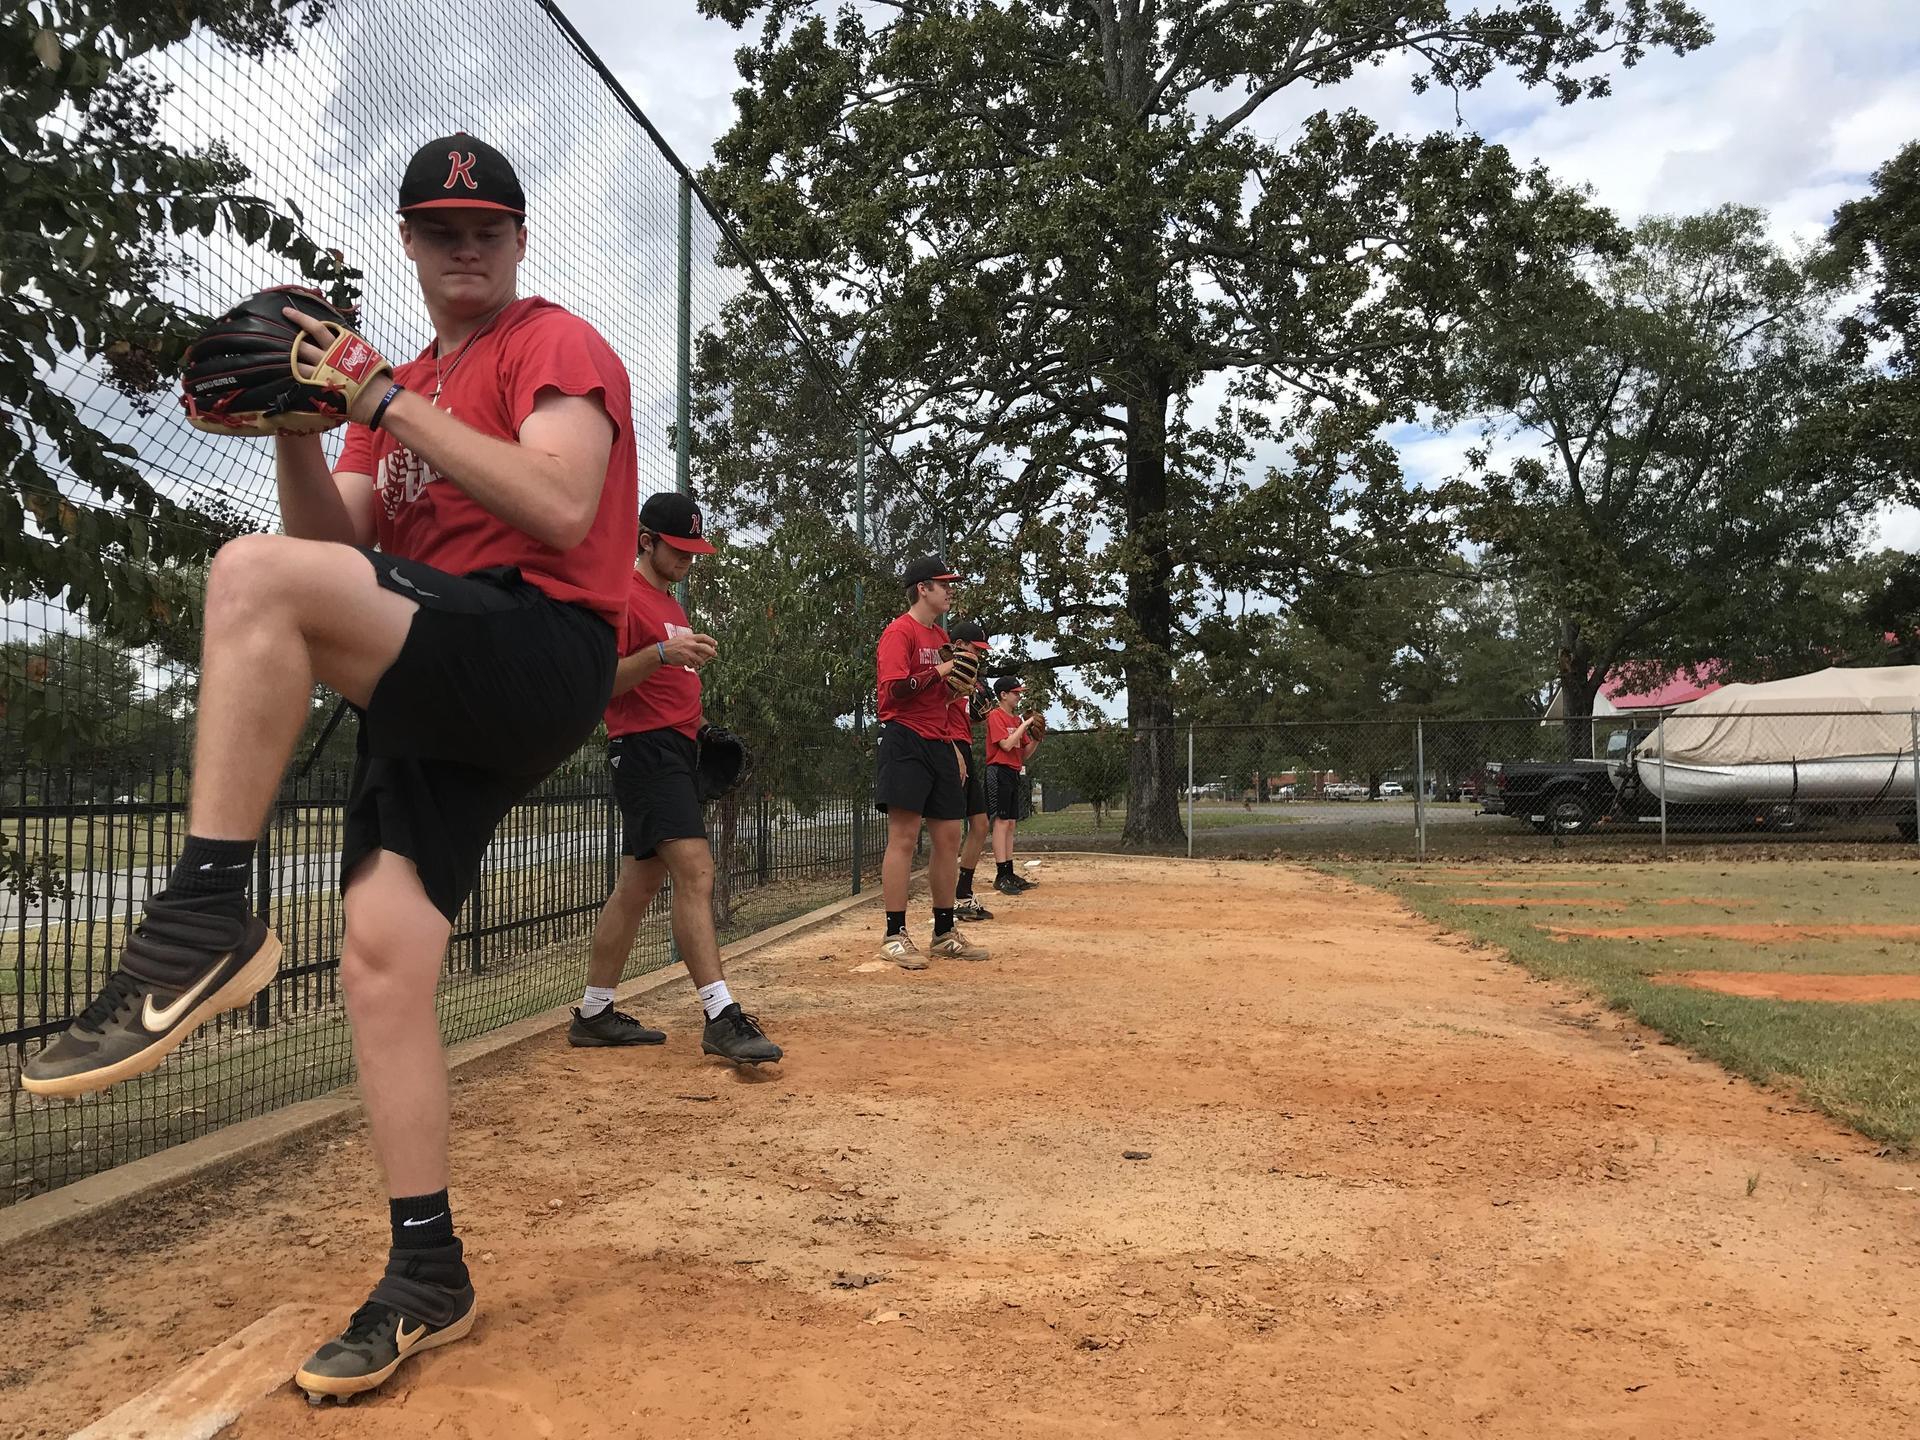 West Lauderdale High School baseball practice